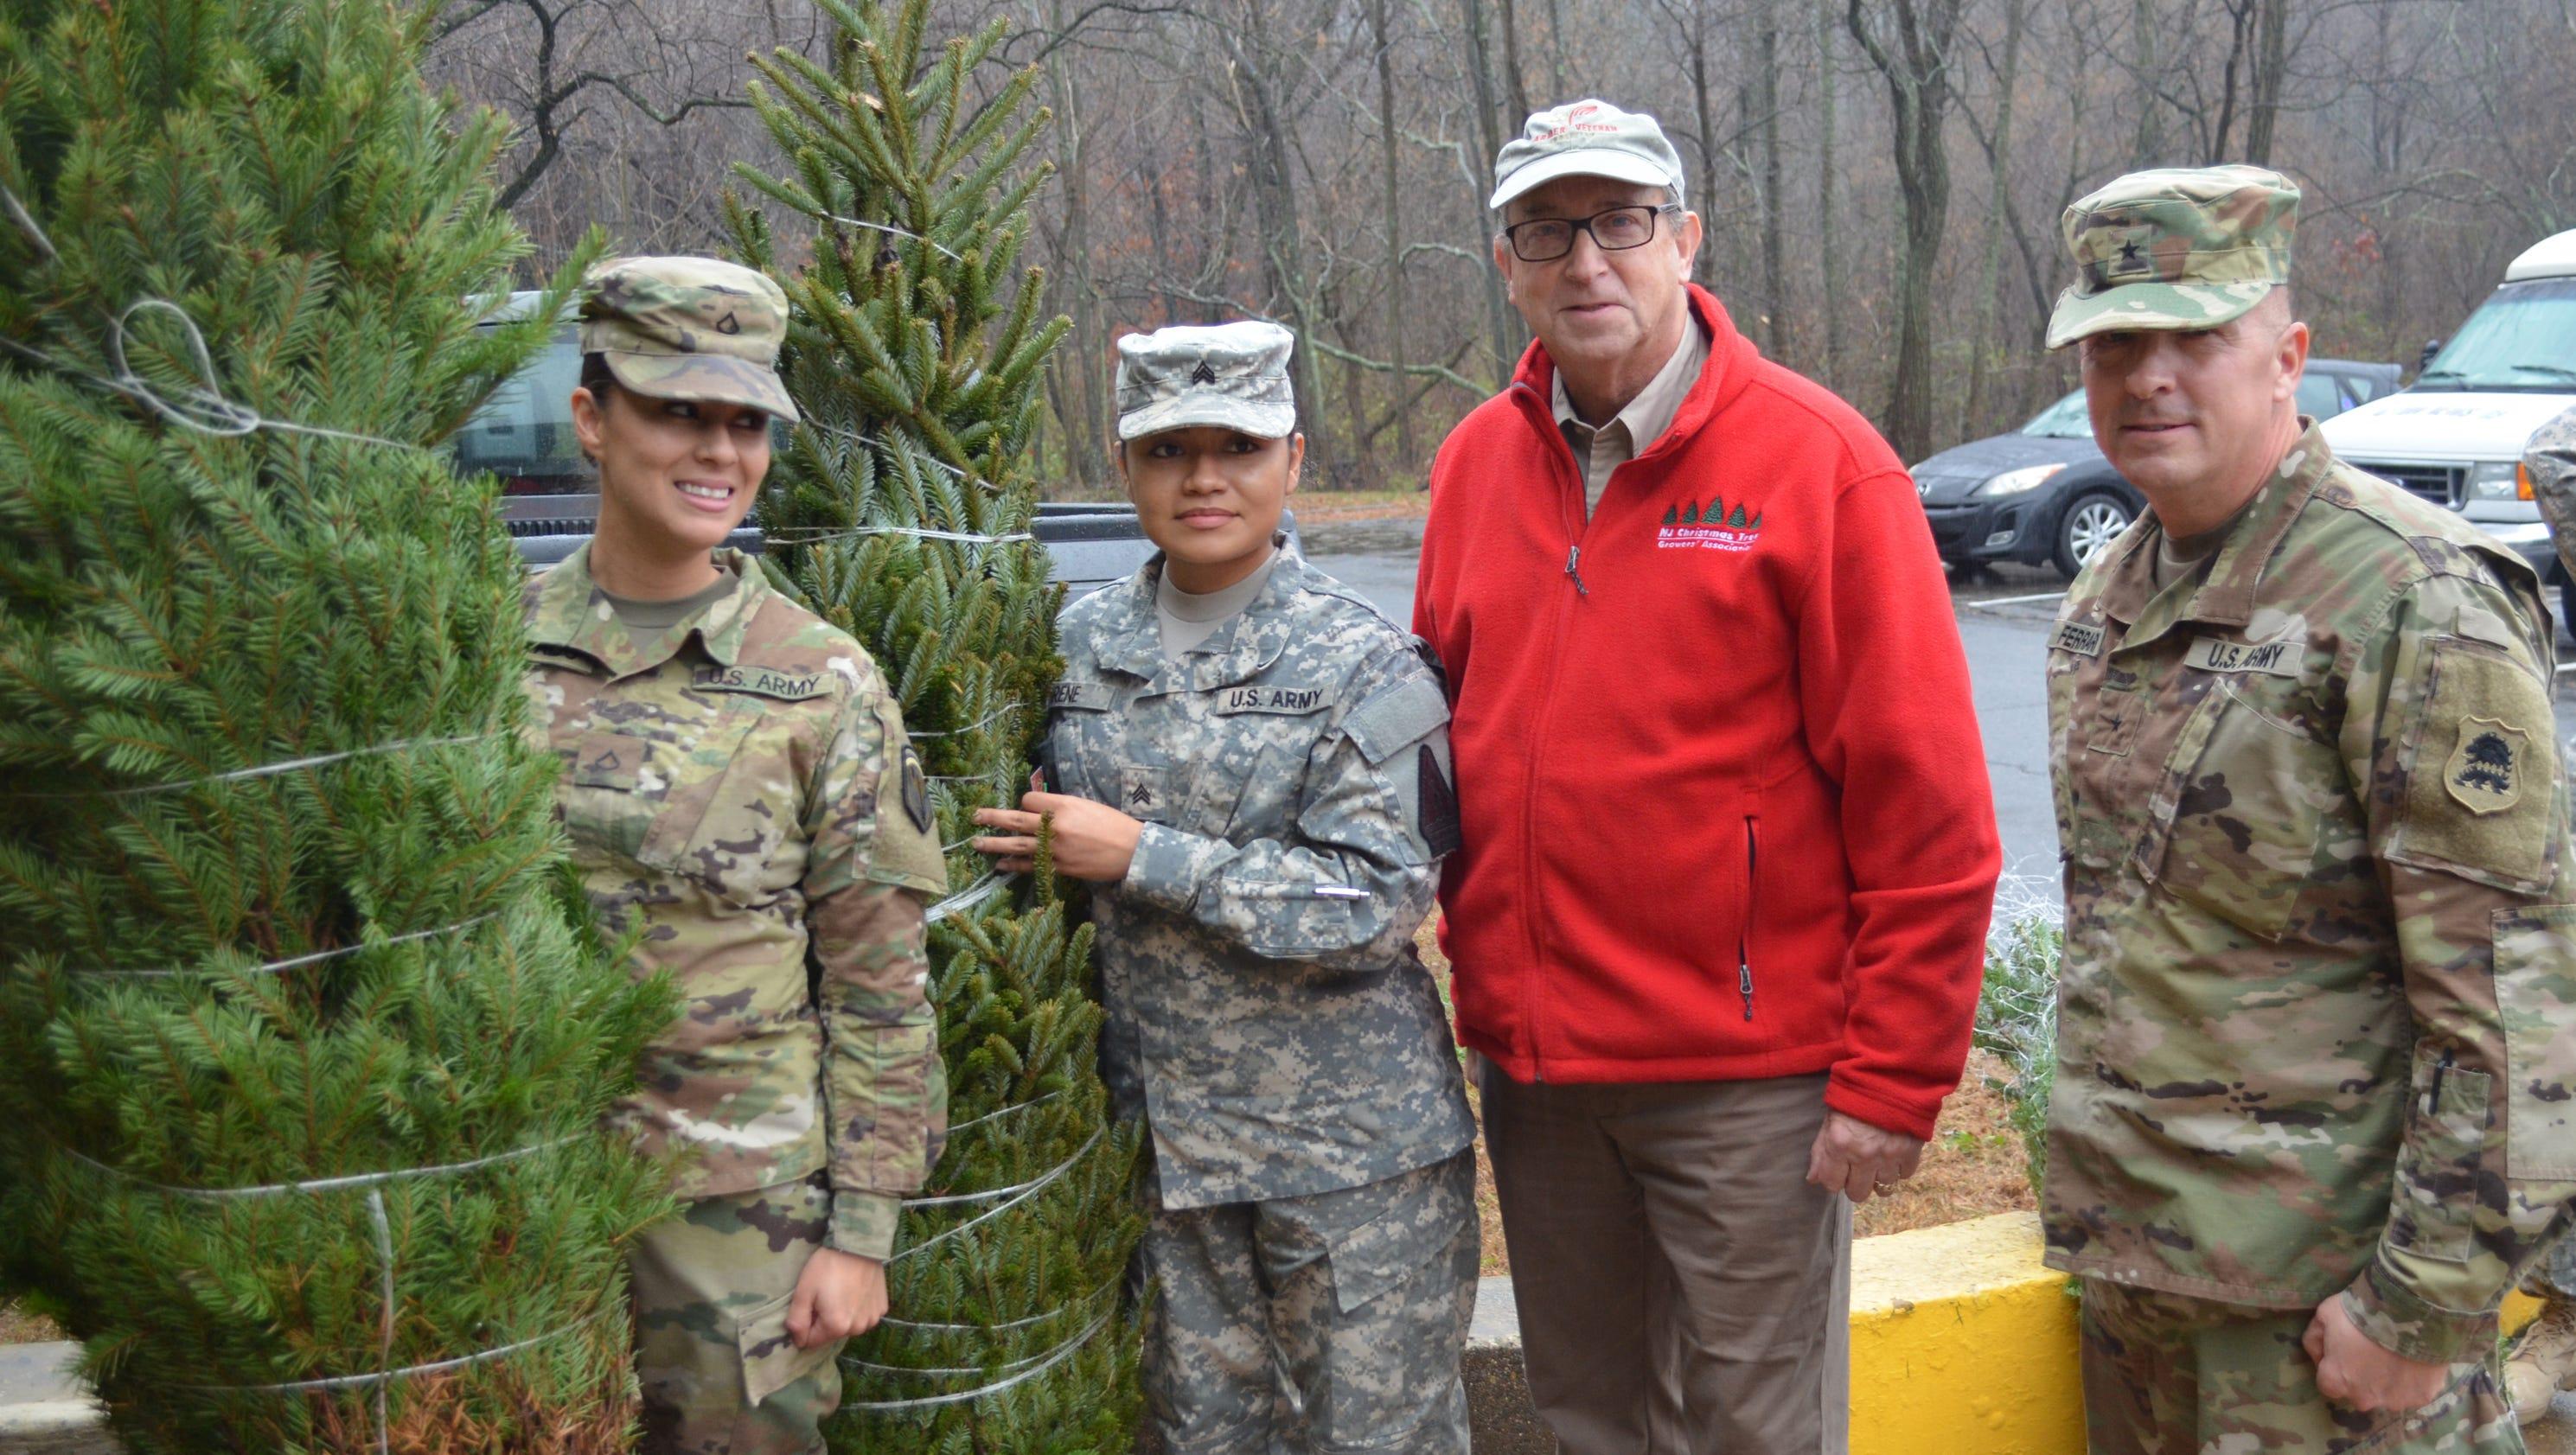 Cut Christmas Trees Nj